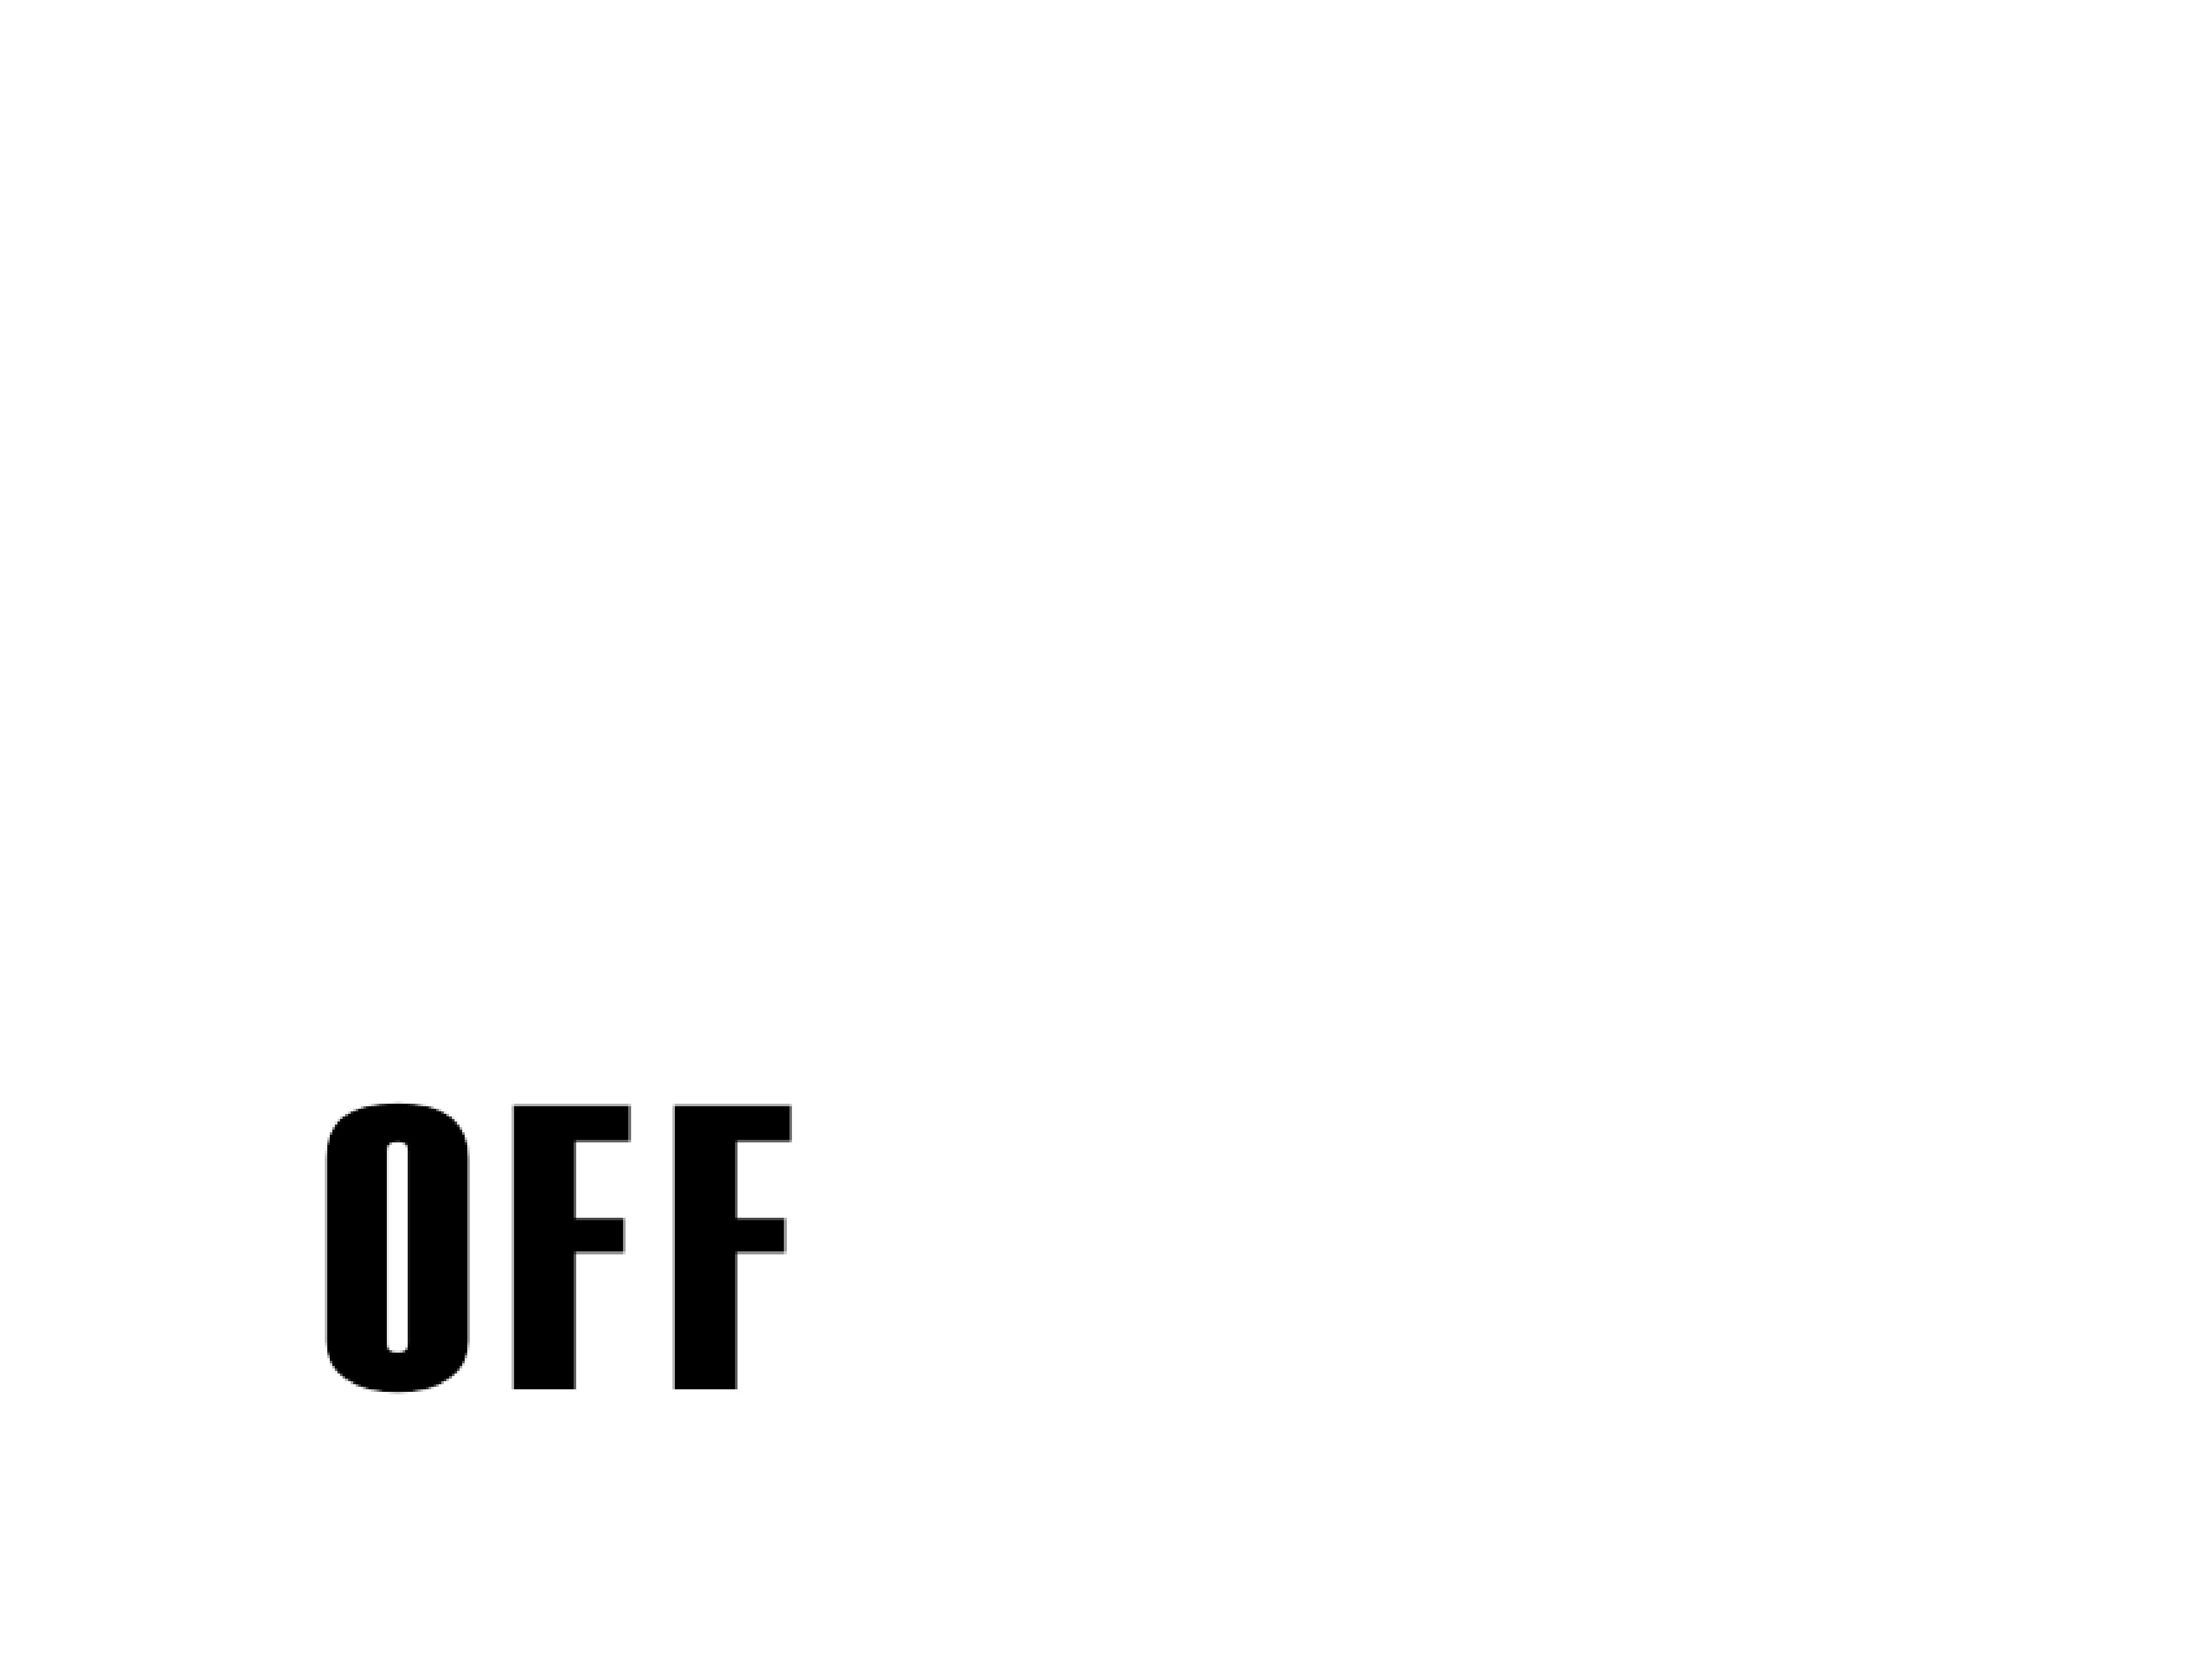 Java Offheap